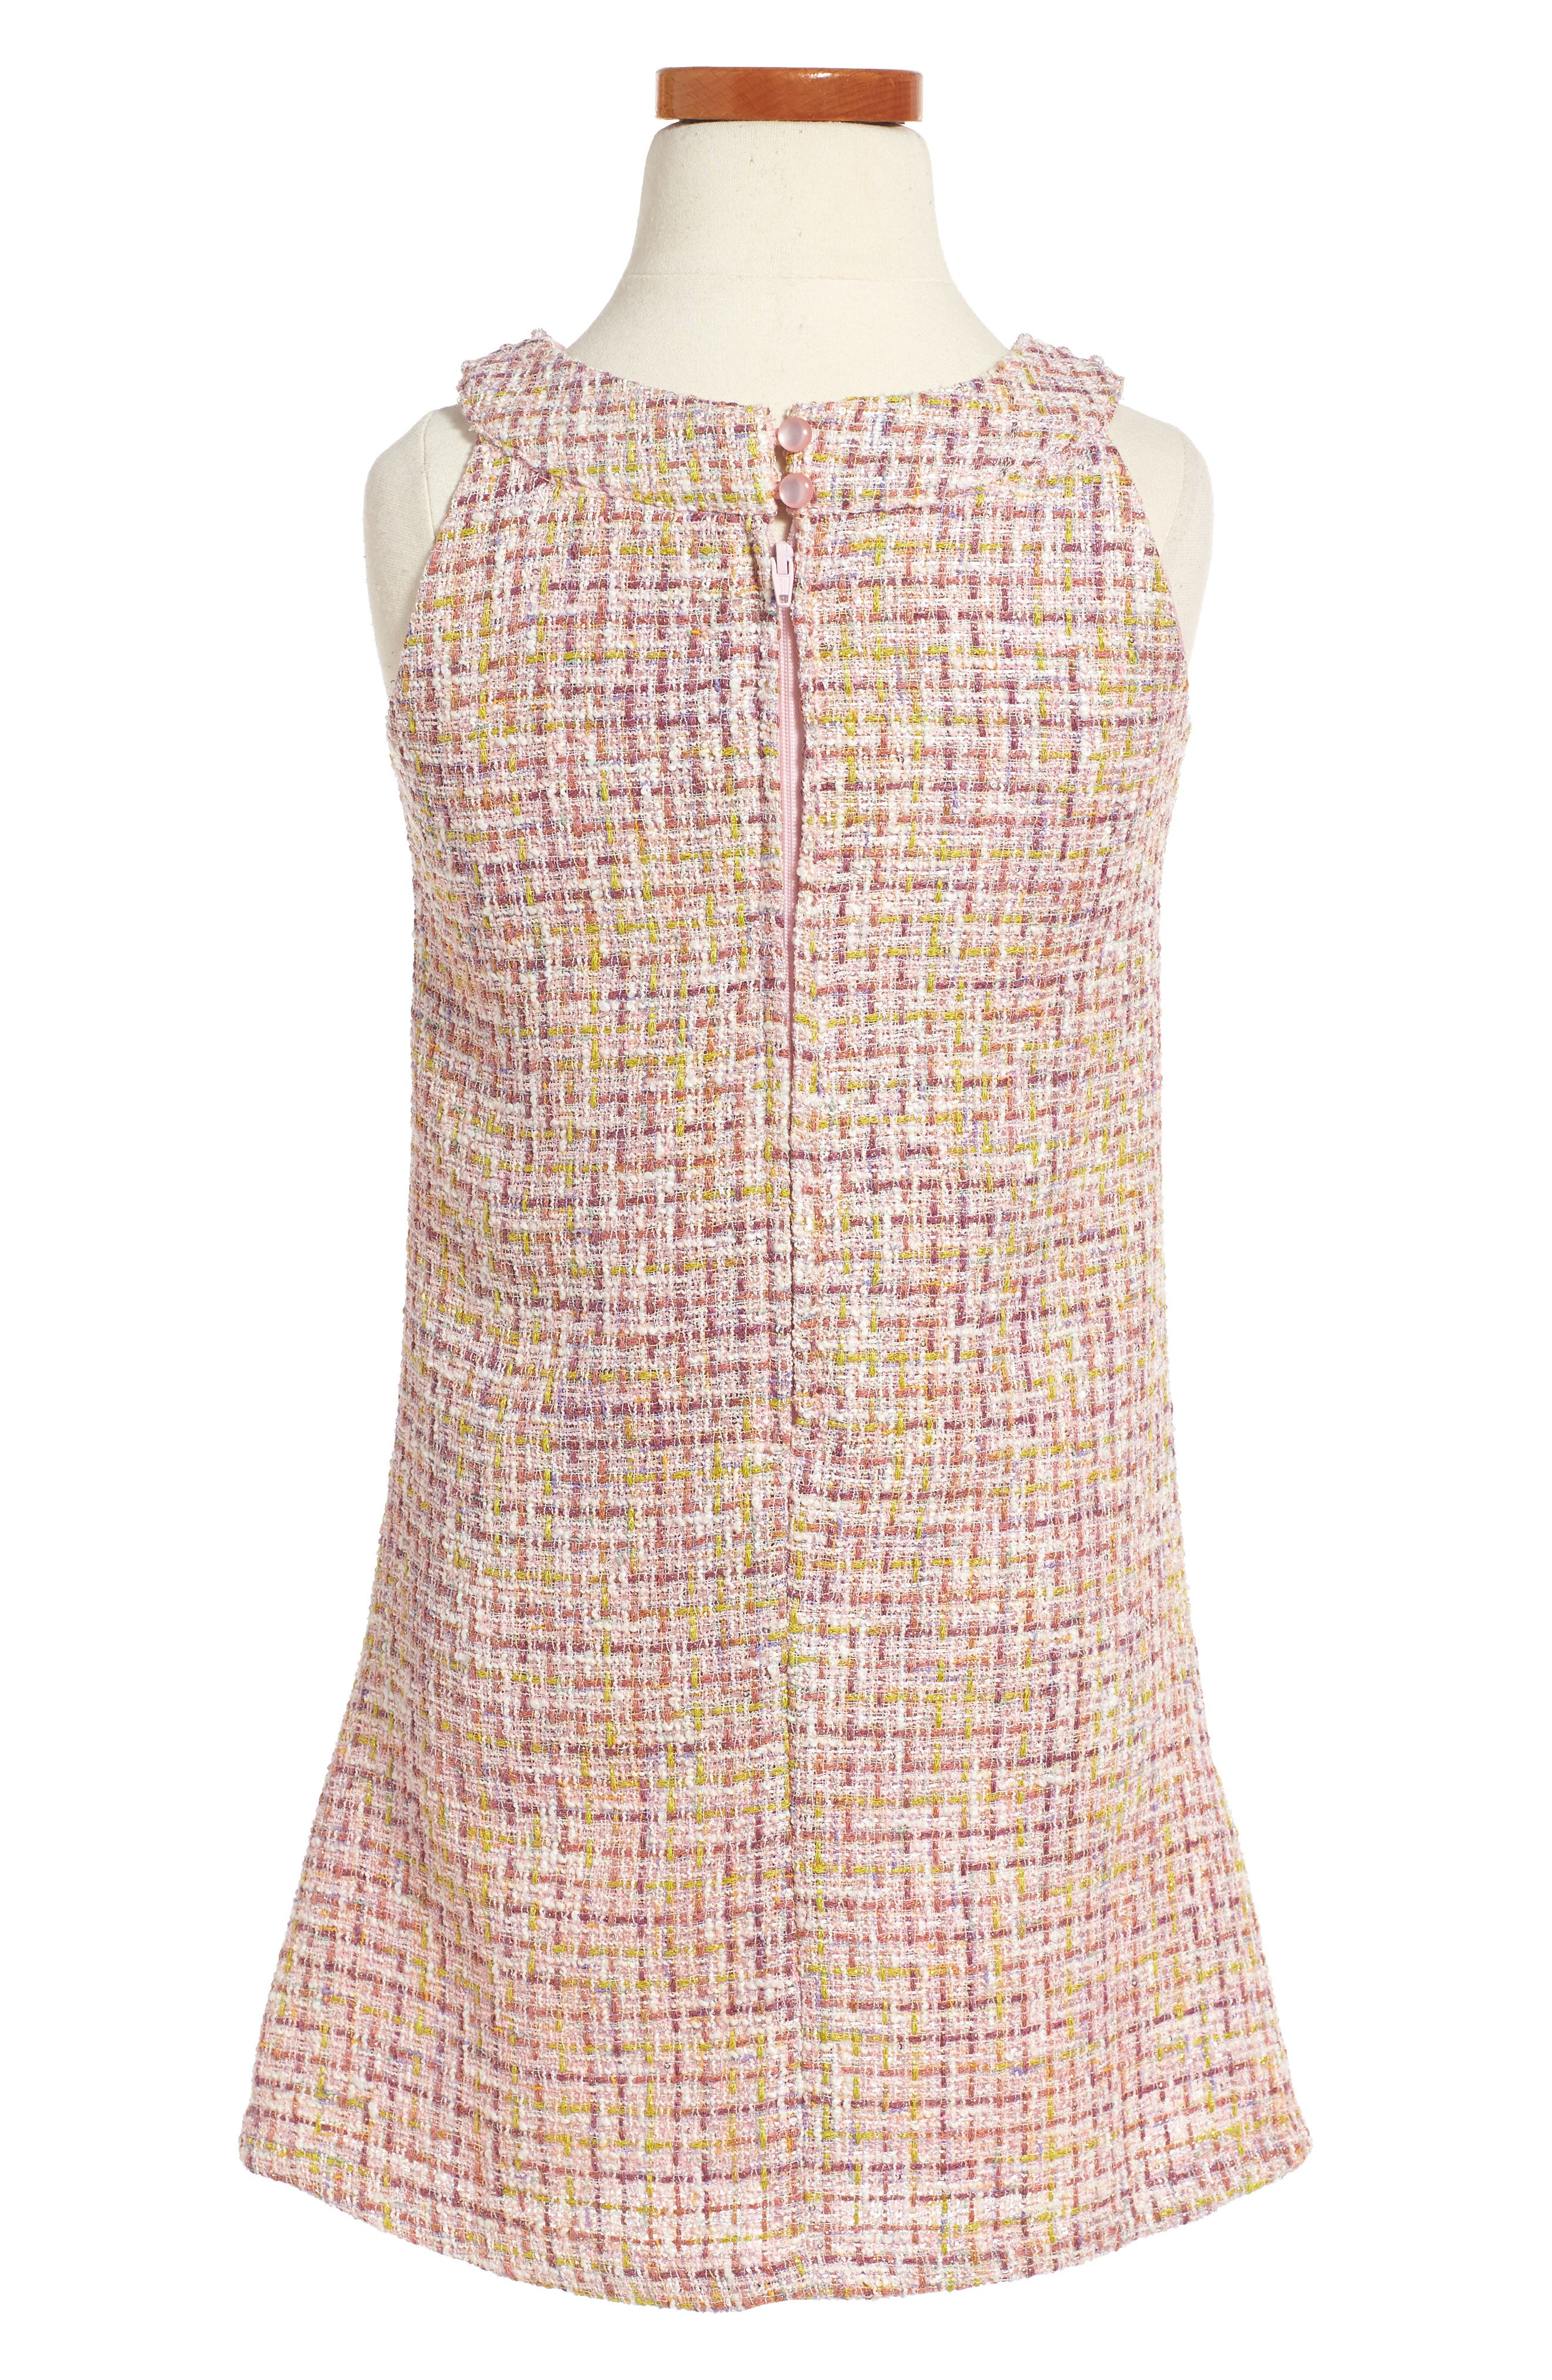 Ringer A-Line Dress,                             Alternate thumbnail 2, color,                             650